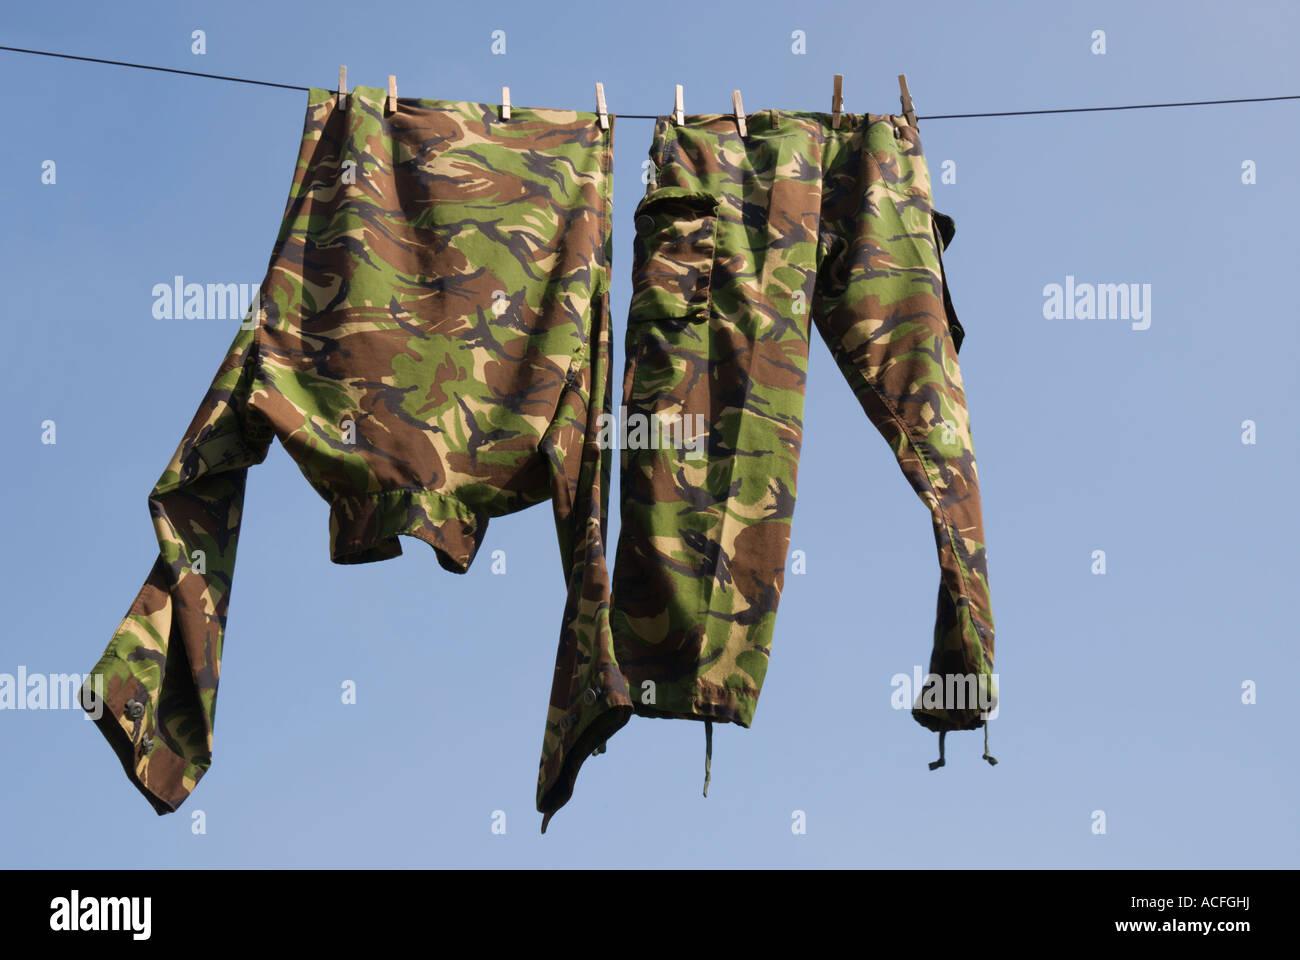 Modern British Army clothing hanging on a washing line - Stock Image